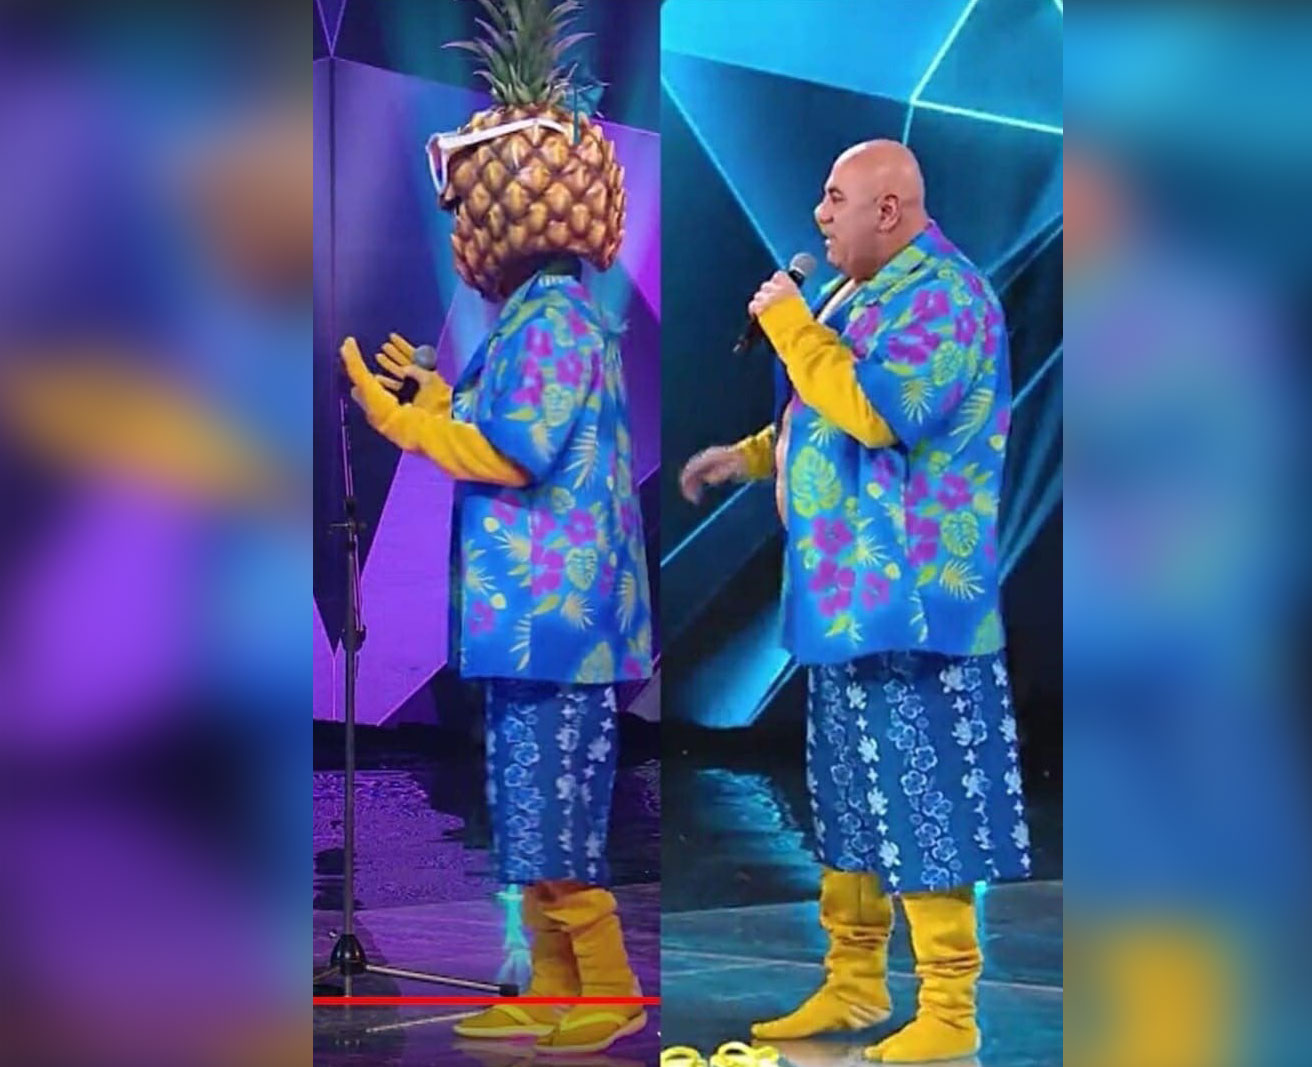 https://www.topnews.ru/wp-content/uploads/2021/03/Ananas-v-shou-Maska.jpg